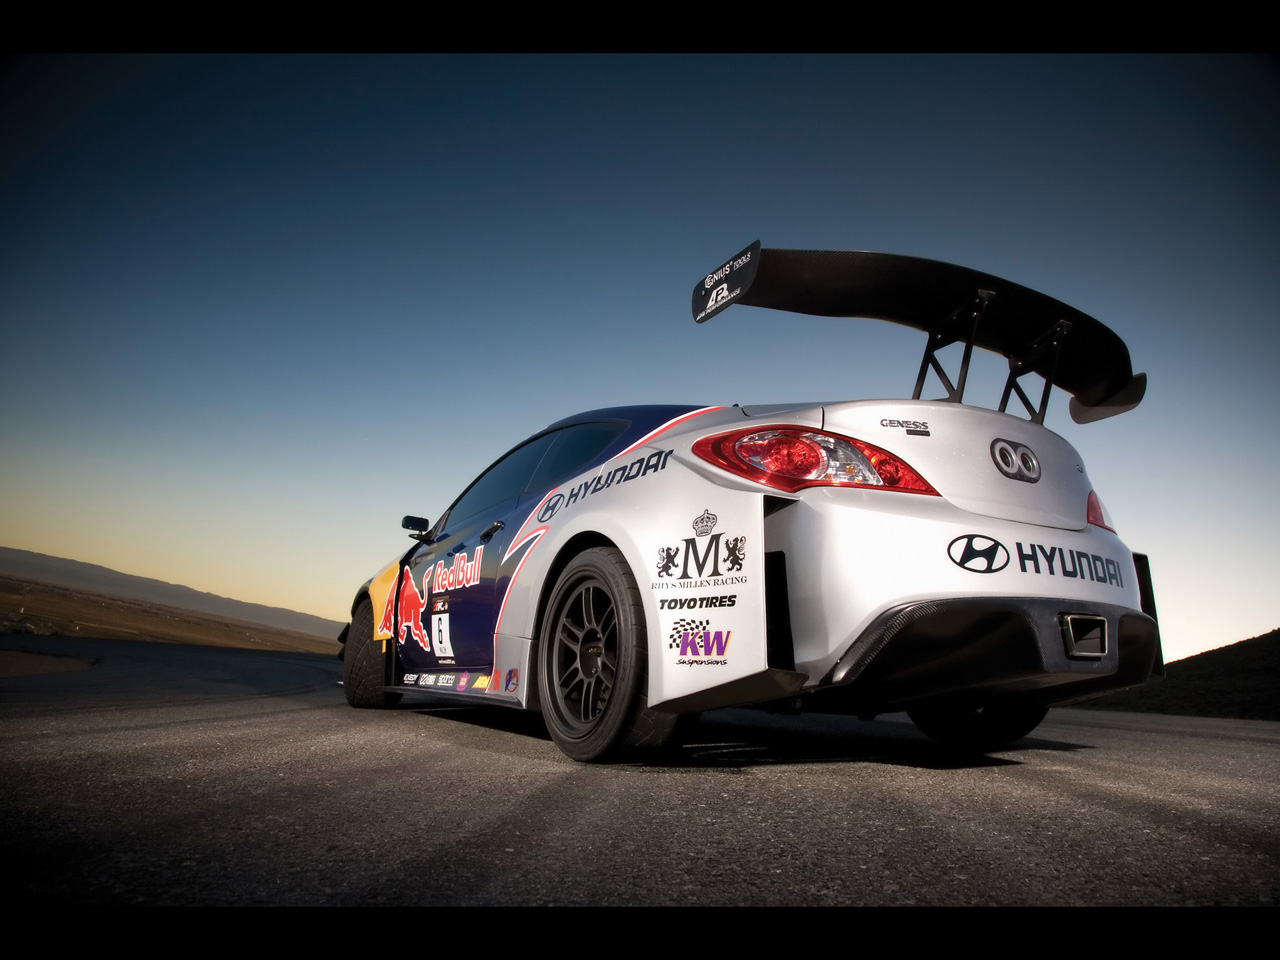 http://2.bp.blogspot.com/-5bLEe63jreI/TjuQyuhp0nI/AAAAAAAAJLw/AeR1yd5opMc/s1600/RMR+Red+Bull+Hyundai+Genesis+Coupe+Bes+Ever+Car+Wallpapers+3.jpg